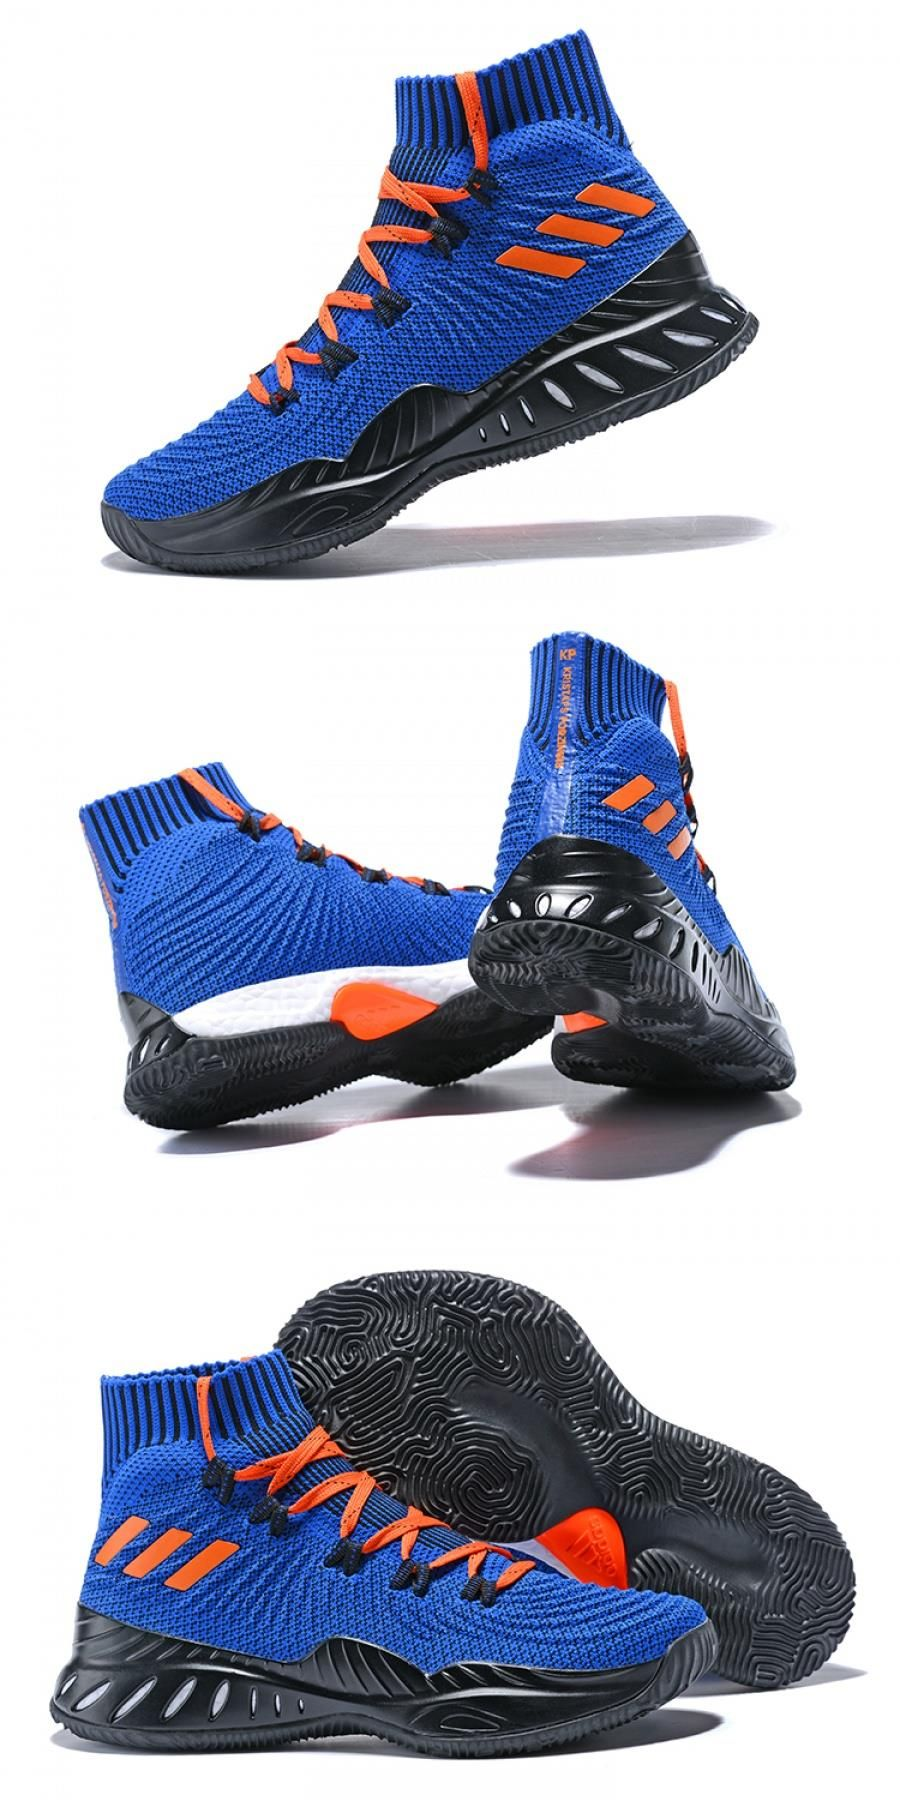 apetito Automatización Generalizar  Adidas Crazy Explosive Kristaps Porzingis Pe Royal/black-orange For